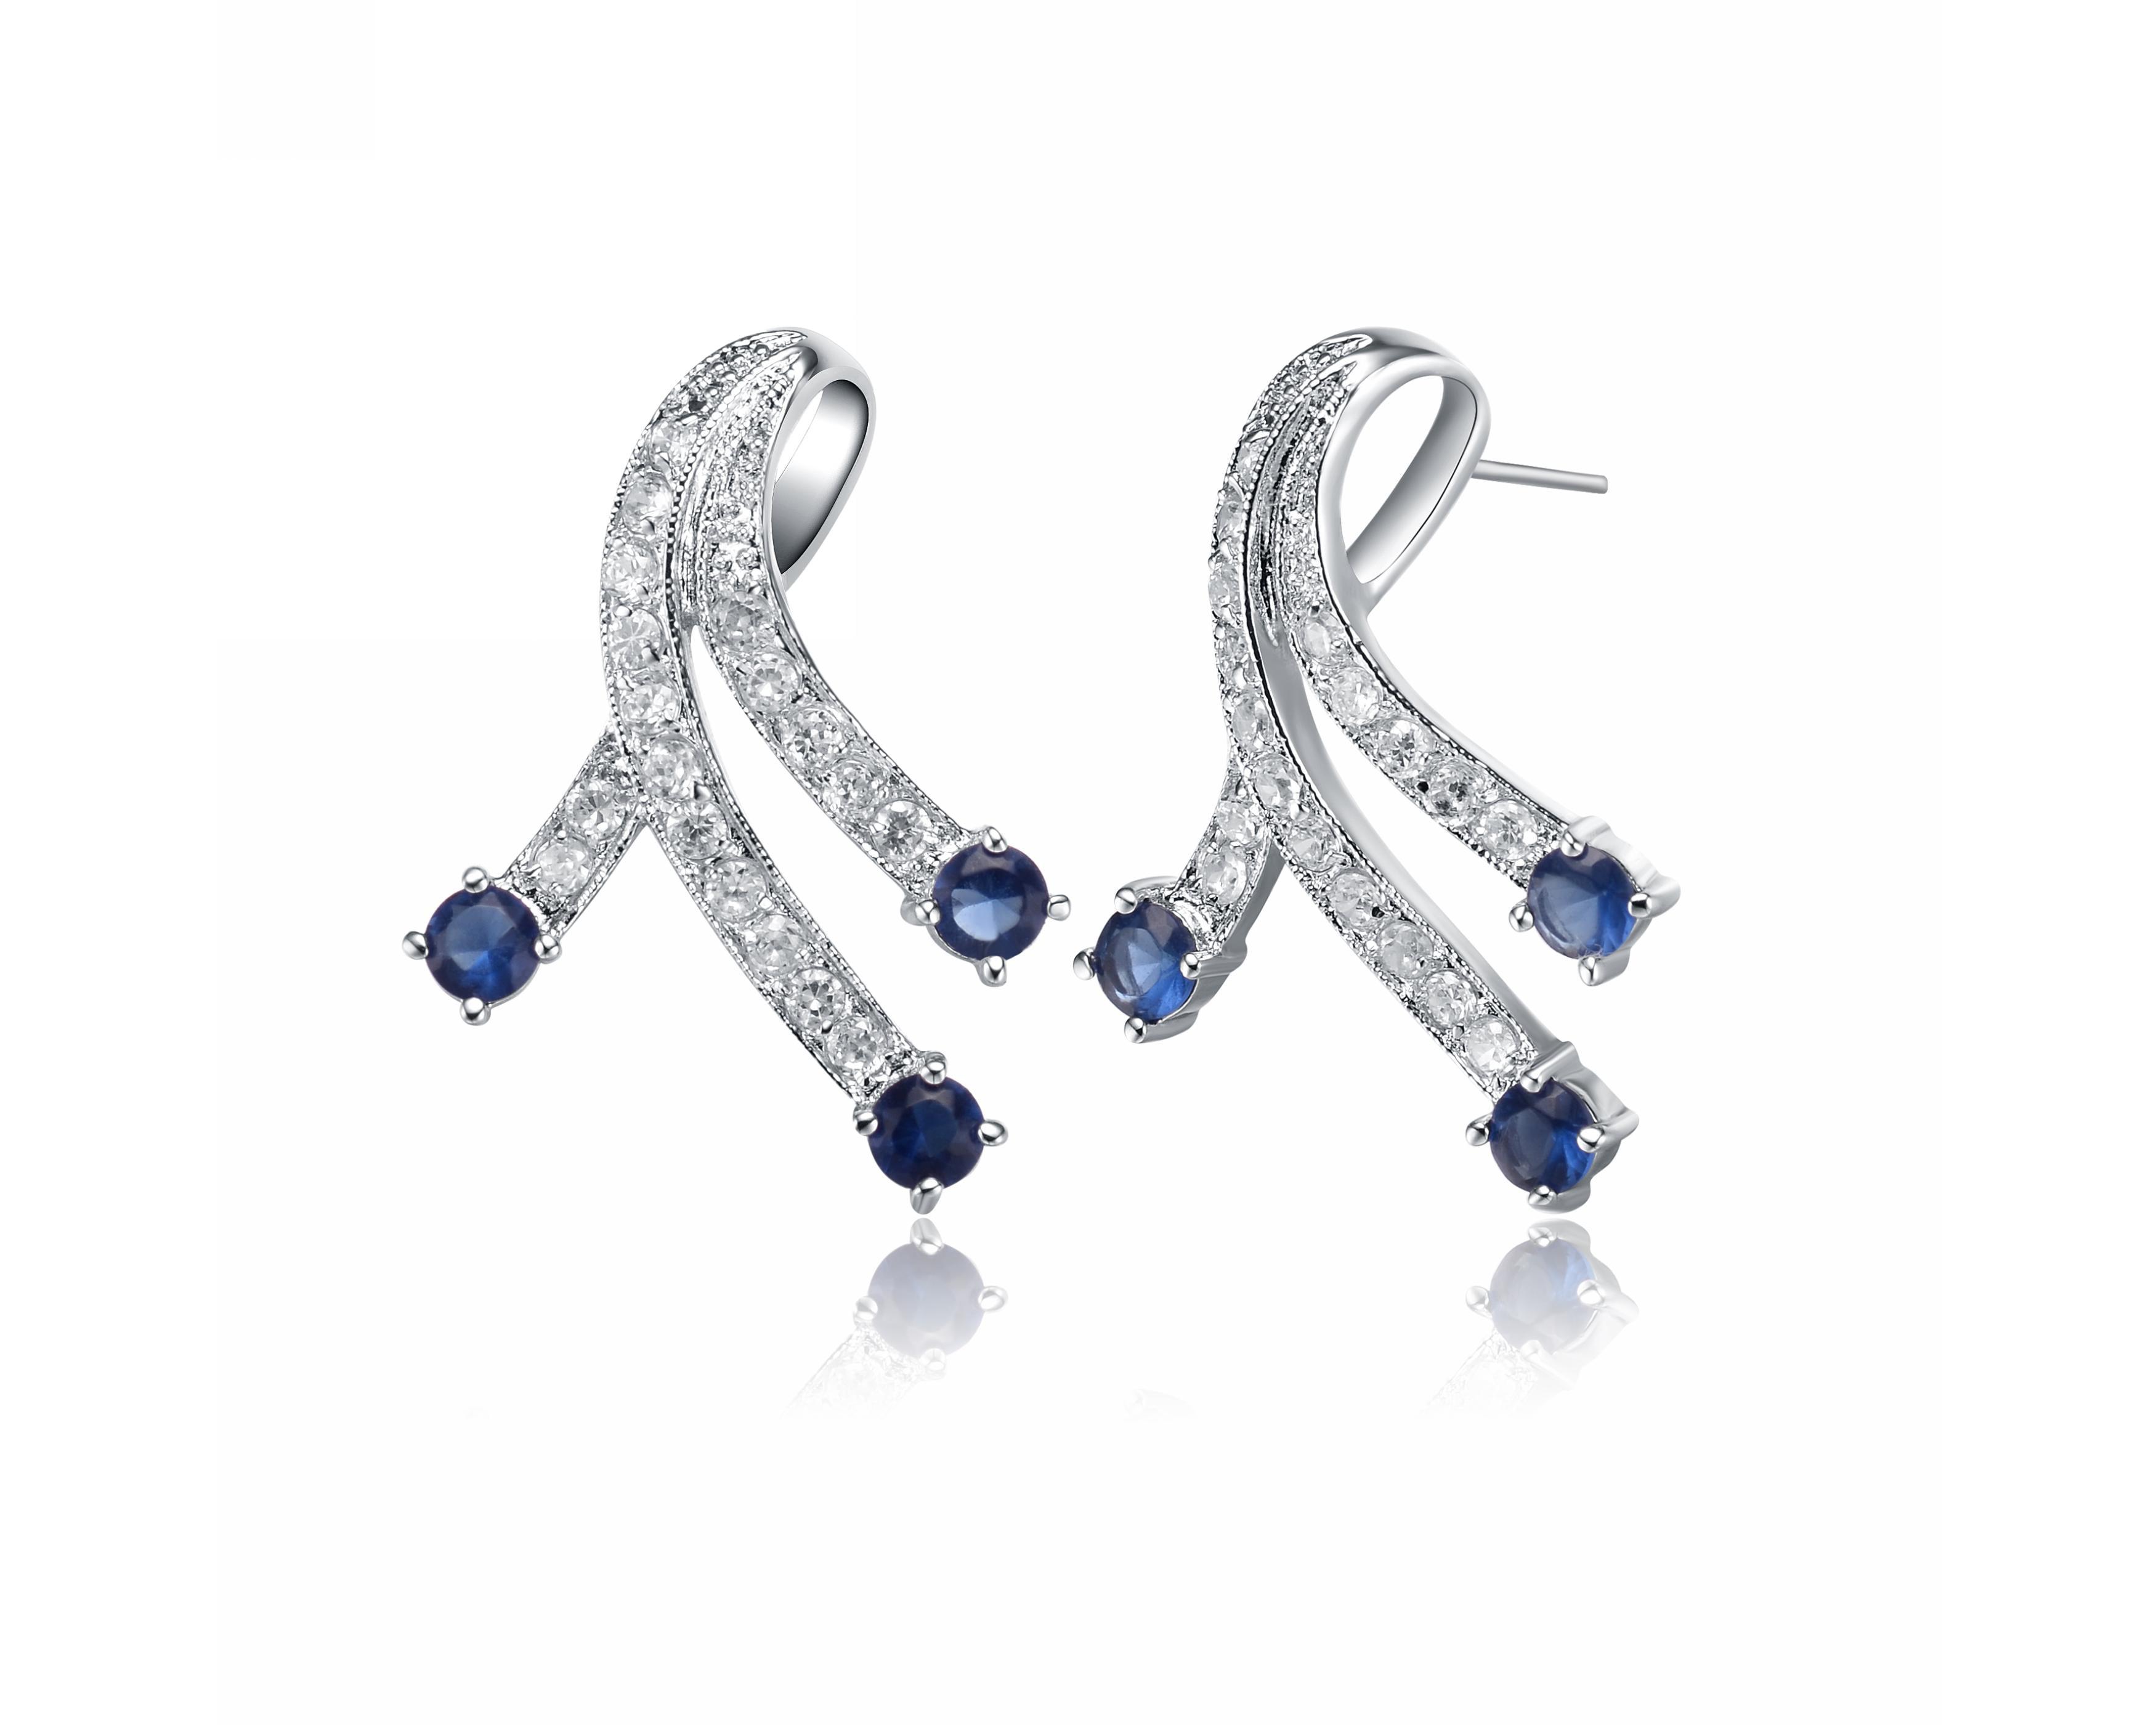 Rozzato Sterling Silver Cubic Zirconia & Blue Ribbon Earrings by Rozzato Jewelry